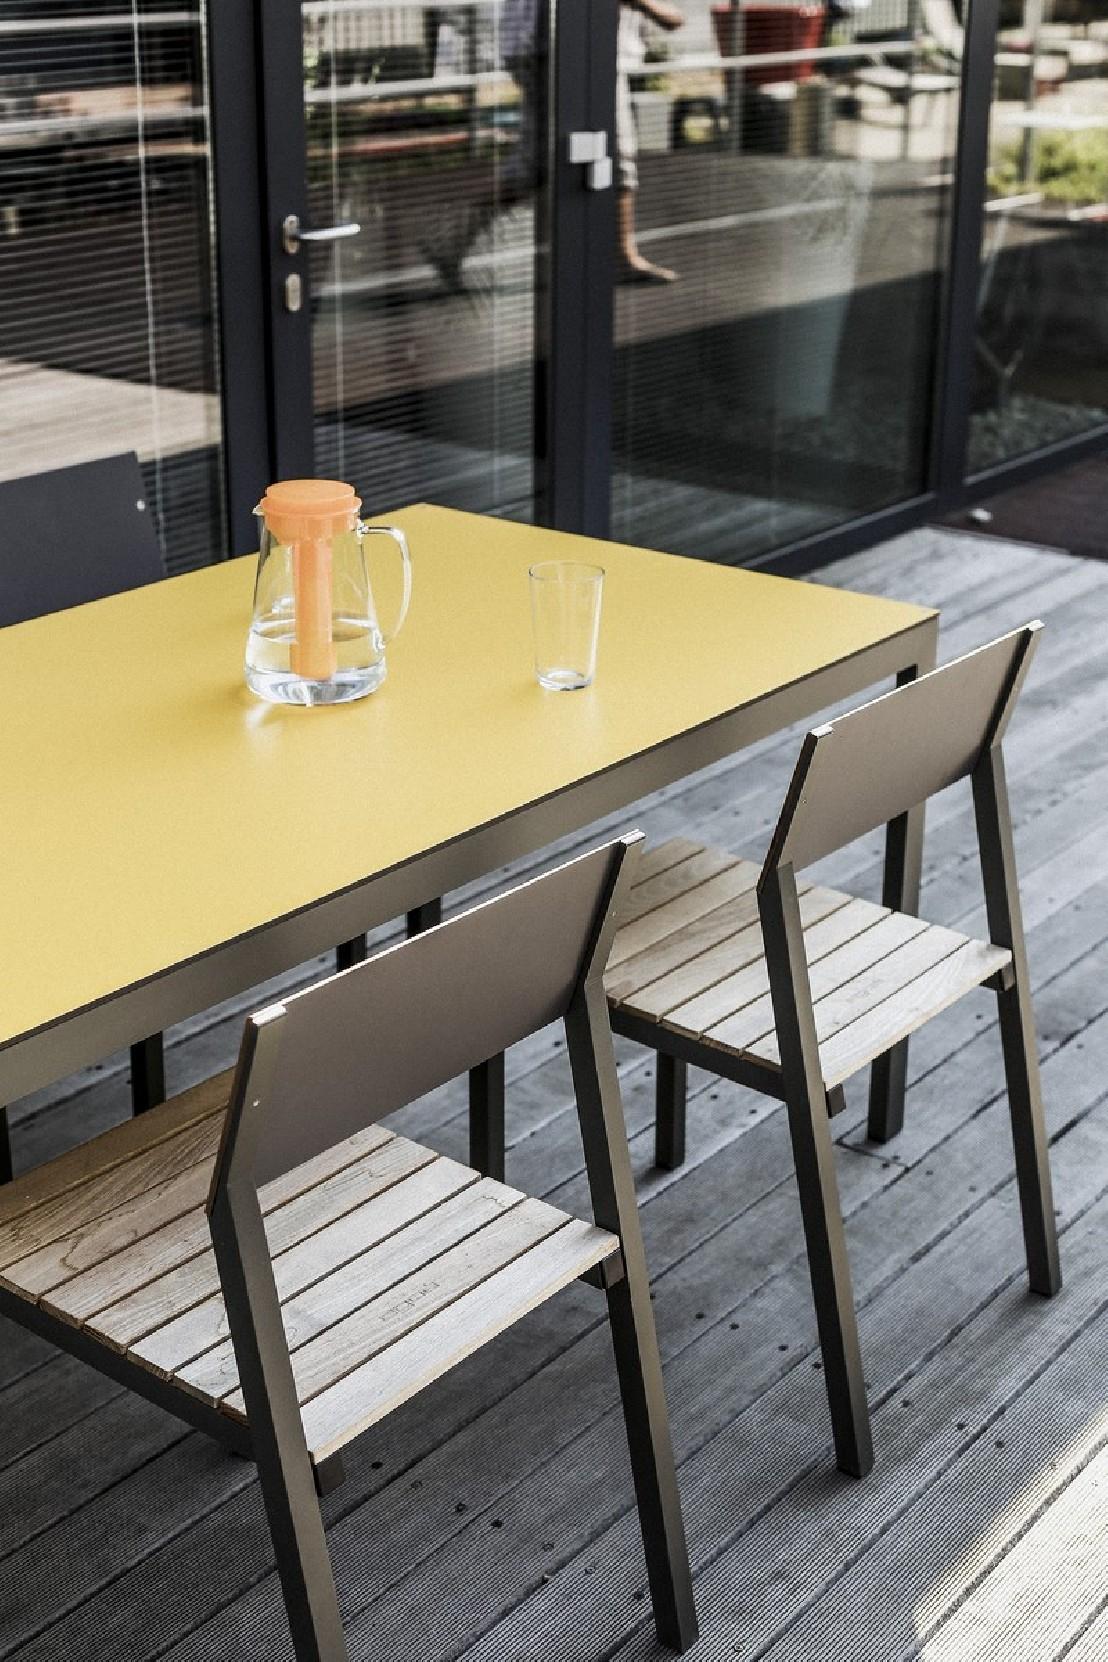 Salon De Jardin Cora, Table Rectangle 175 Cm Et 4 Chaises ... avec Salon De Jardin Cora